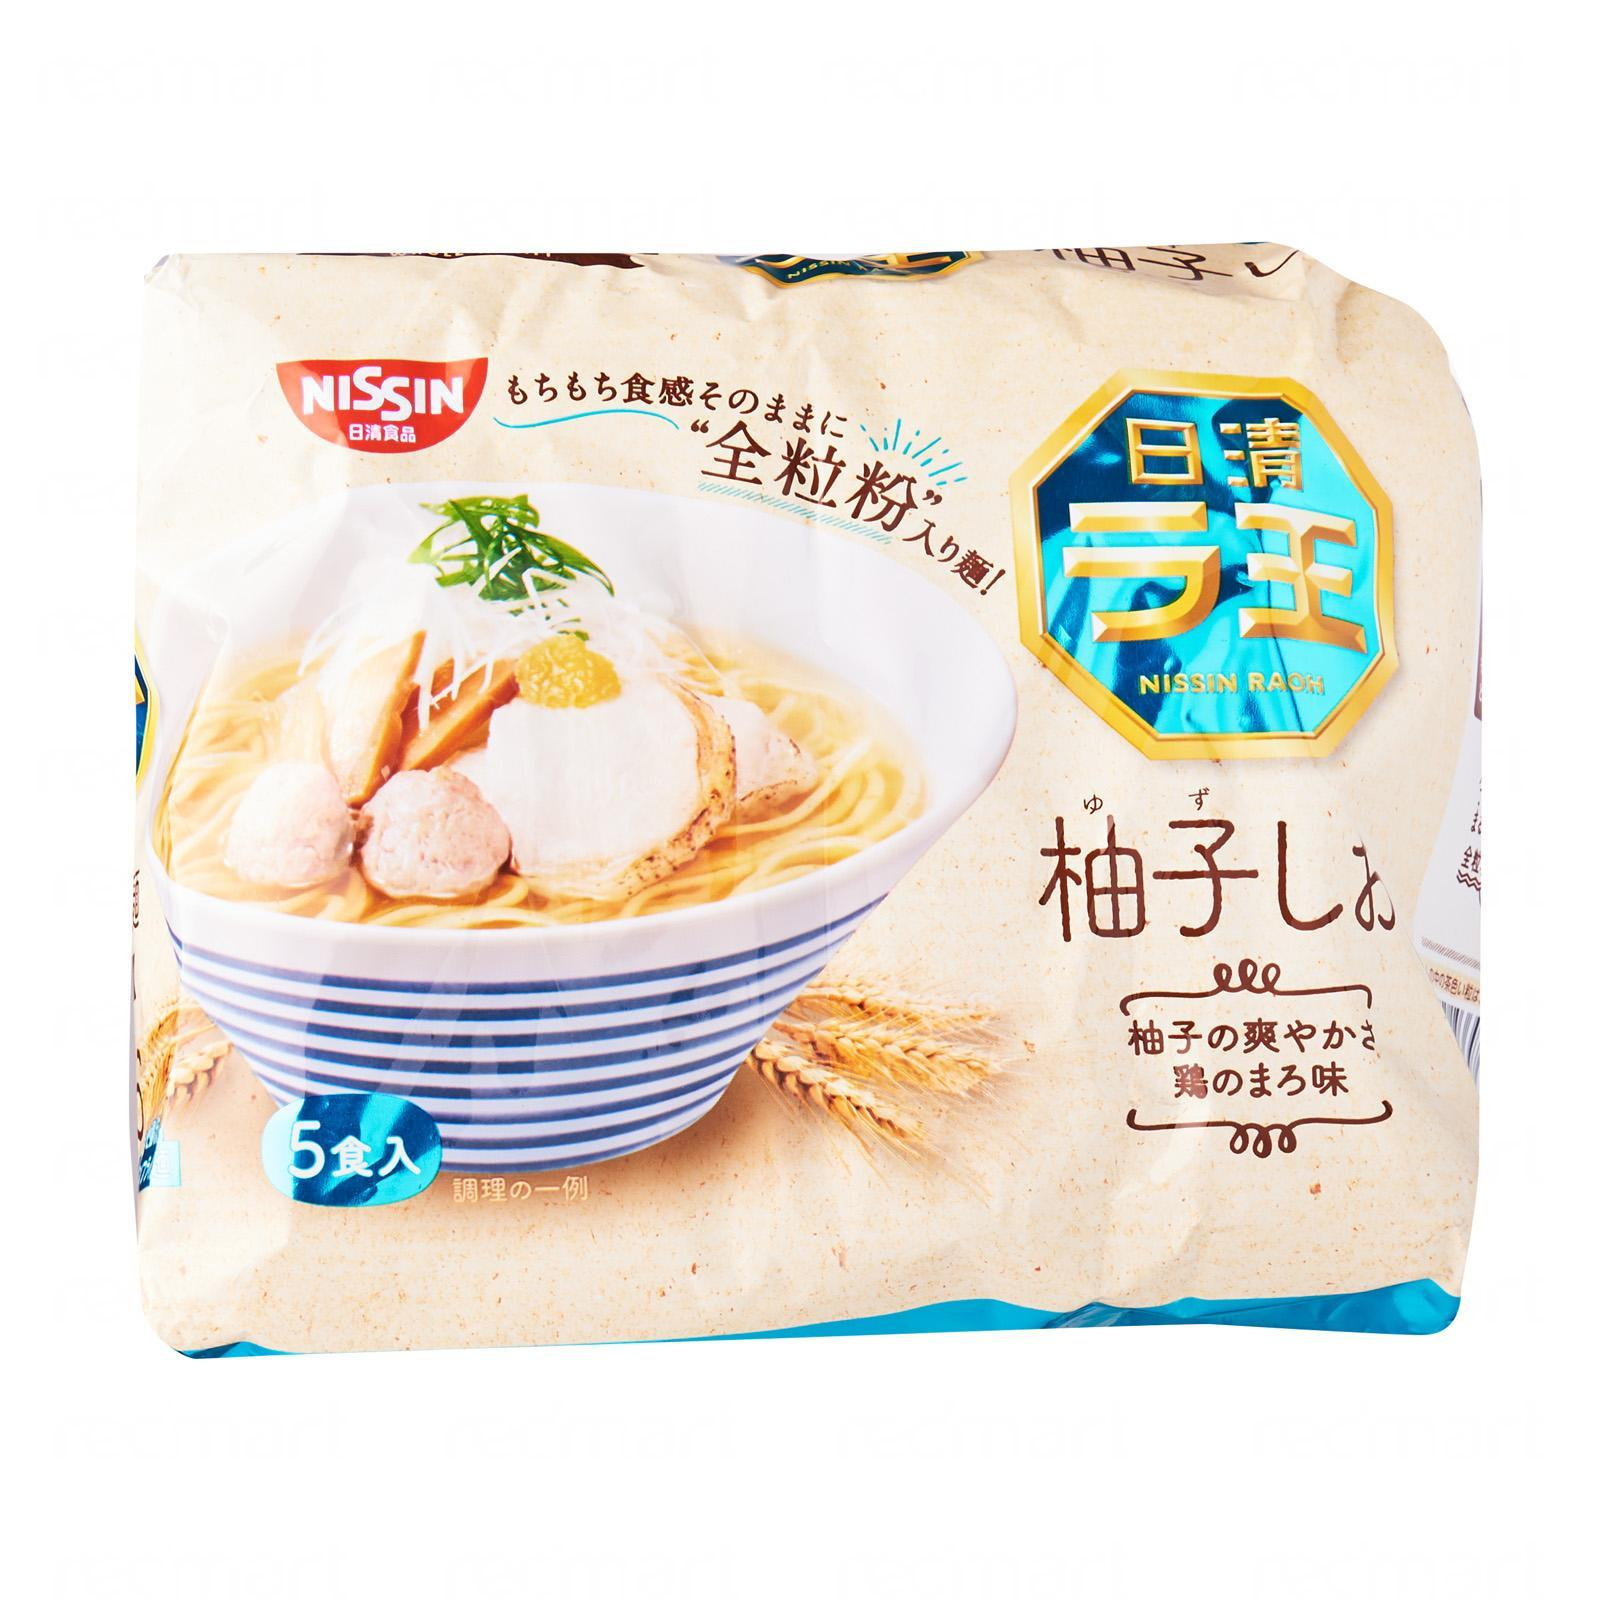 Nissin RA-OH Yuzu Shio Flavour Instant Ramen Noodles